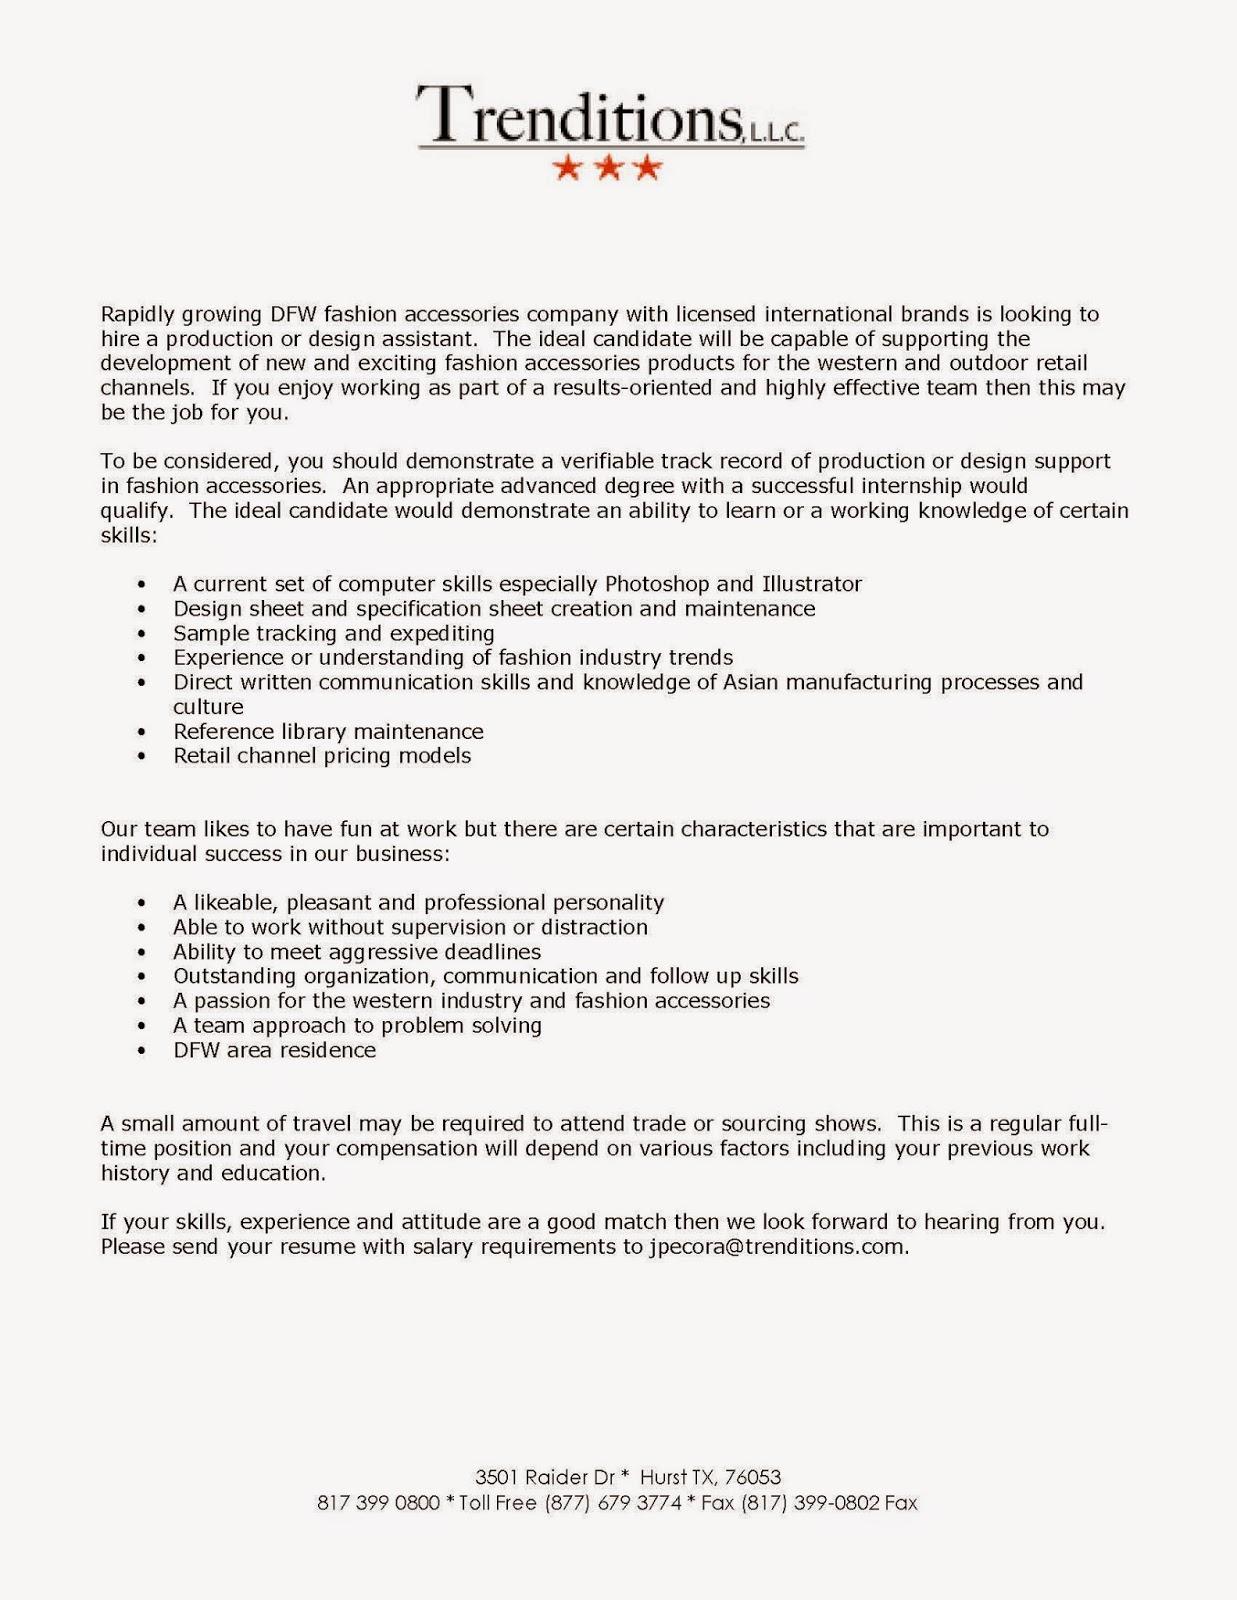 senior instructional designer job description